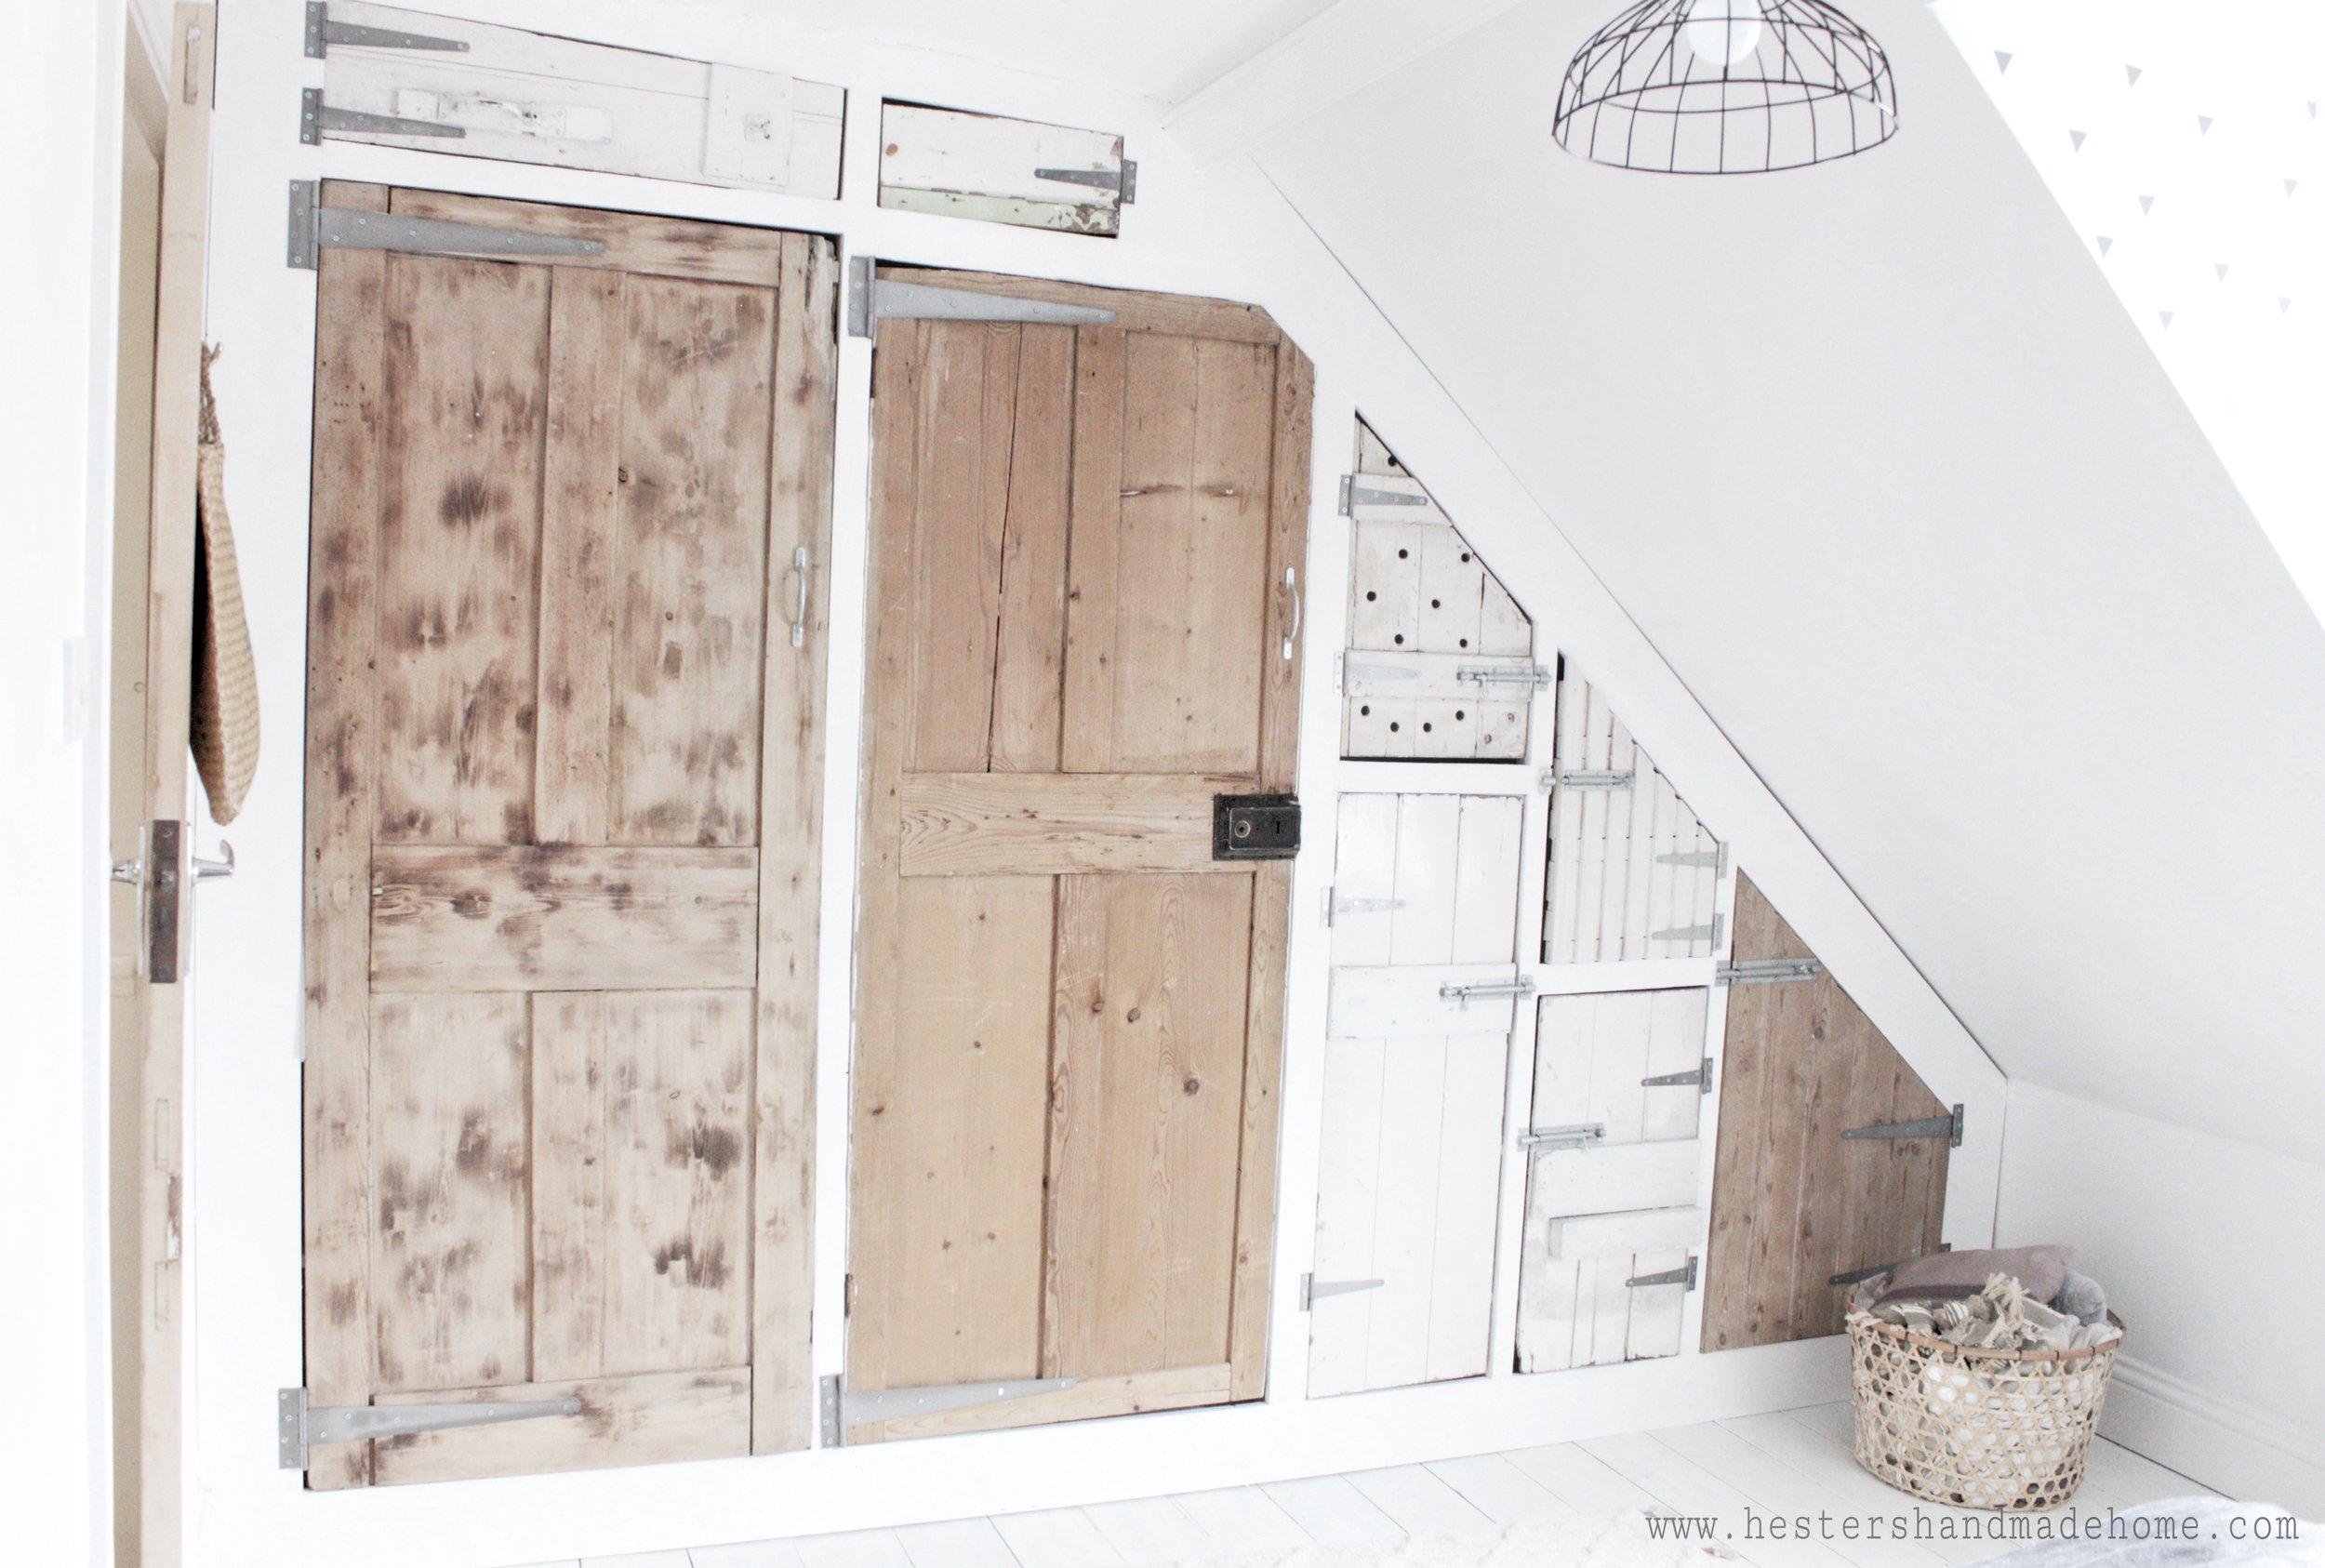 Wardrobe diy tutorial using Ikea and reclaimed doors, tutorial by Hesters Handmade Home